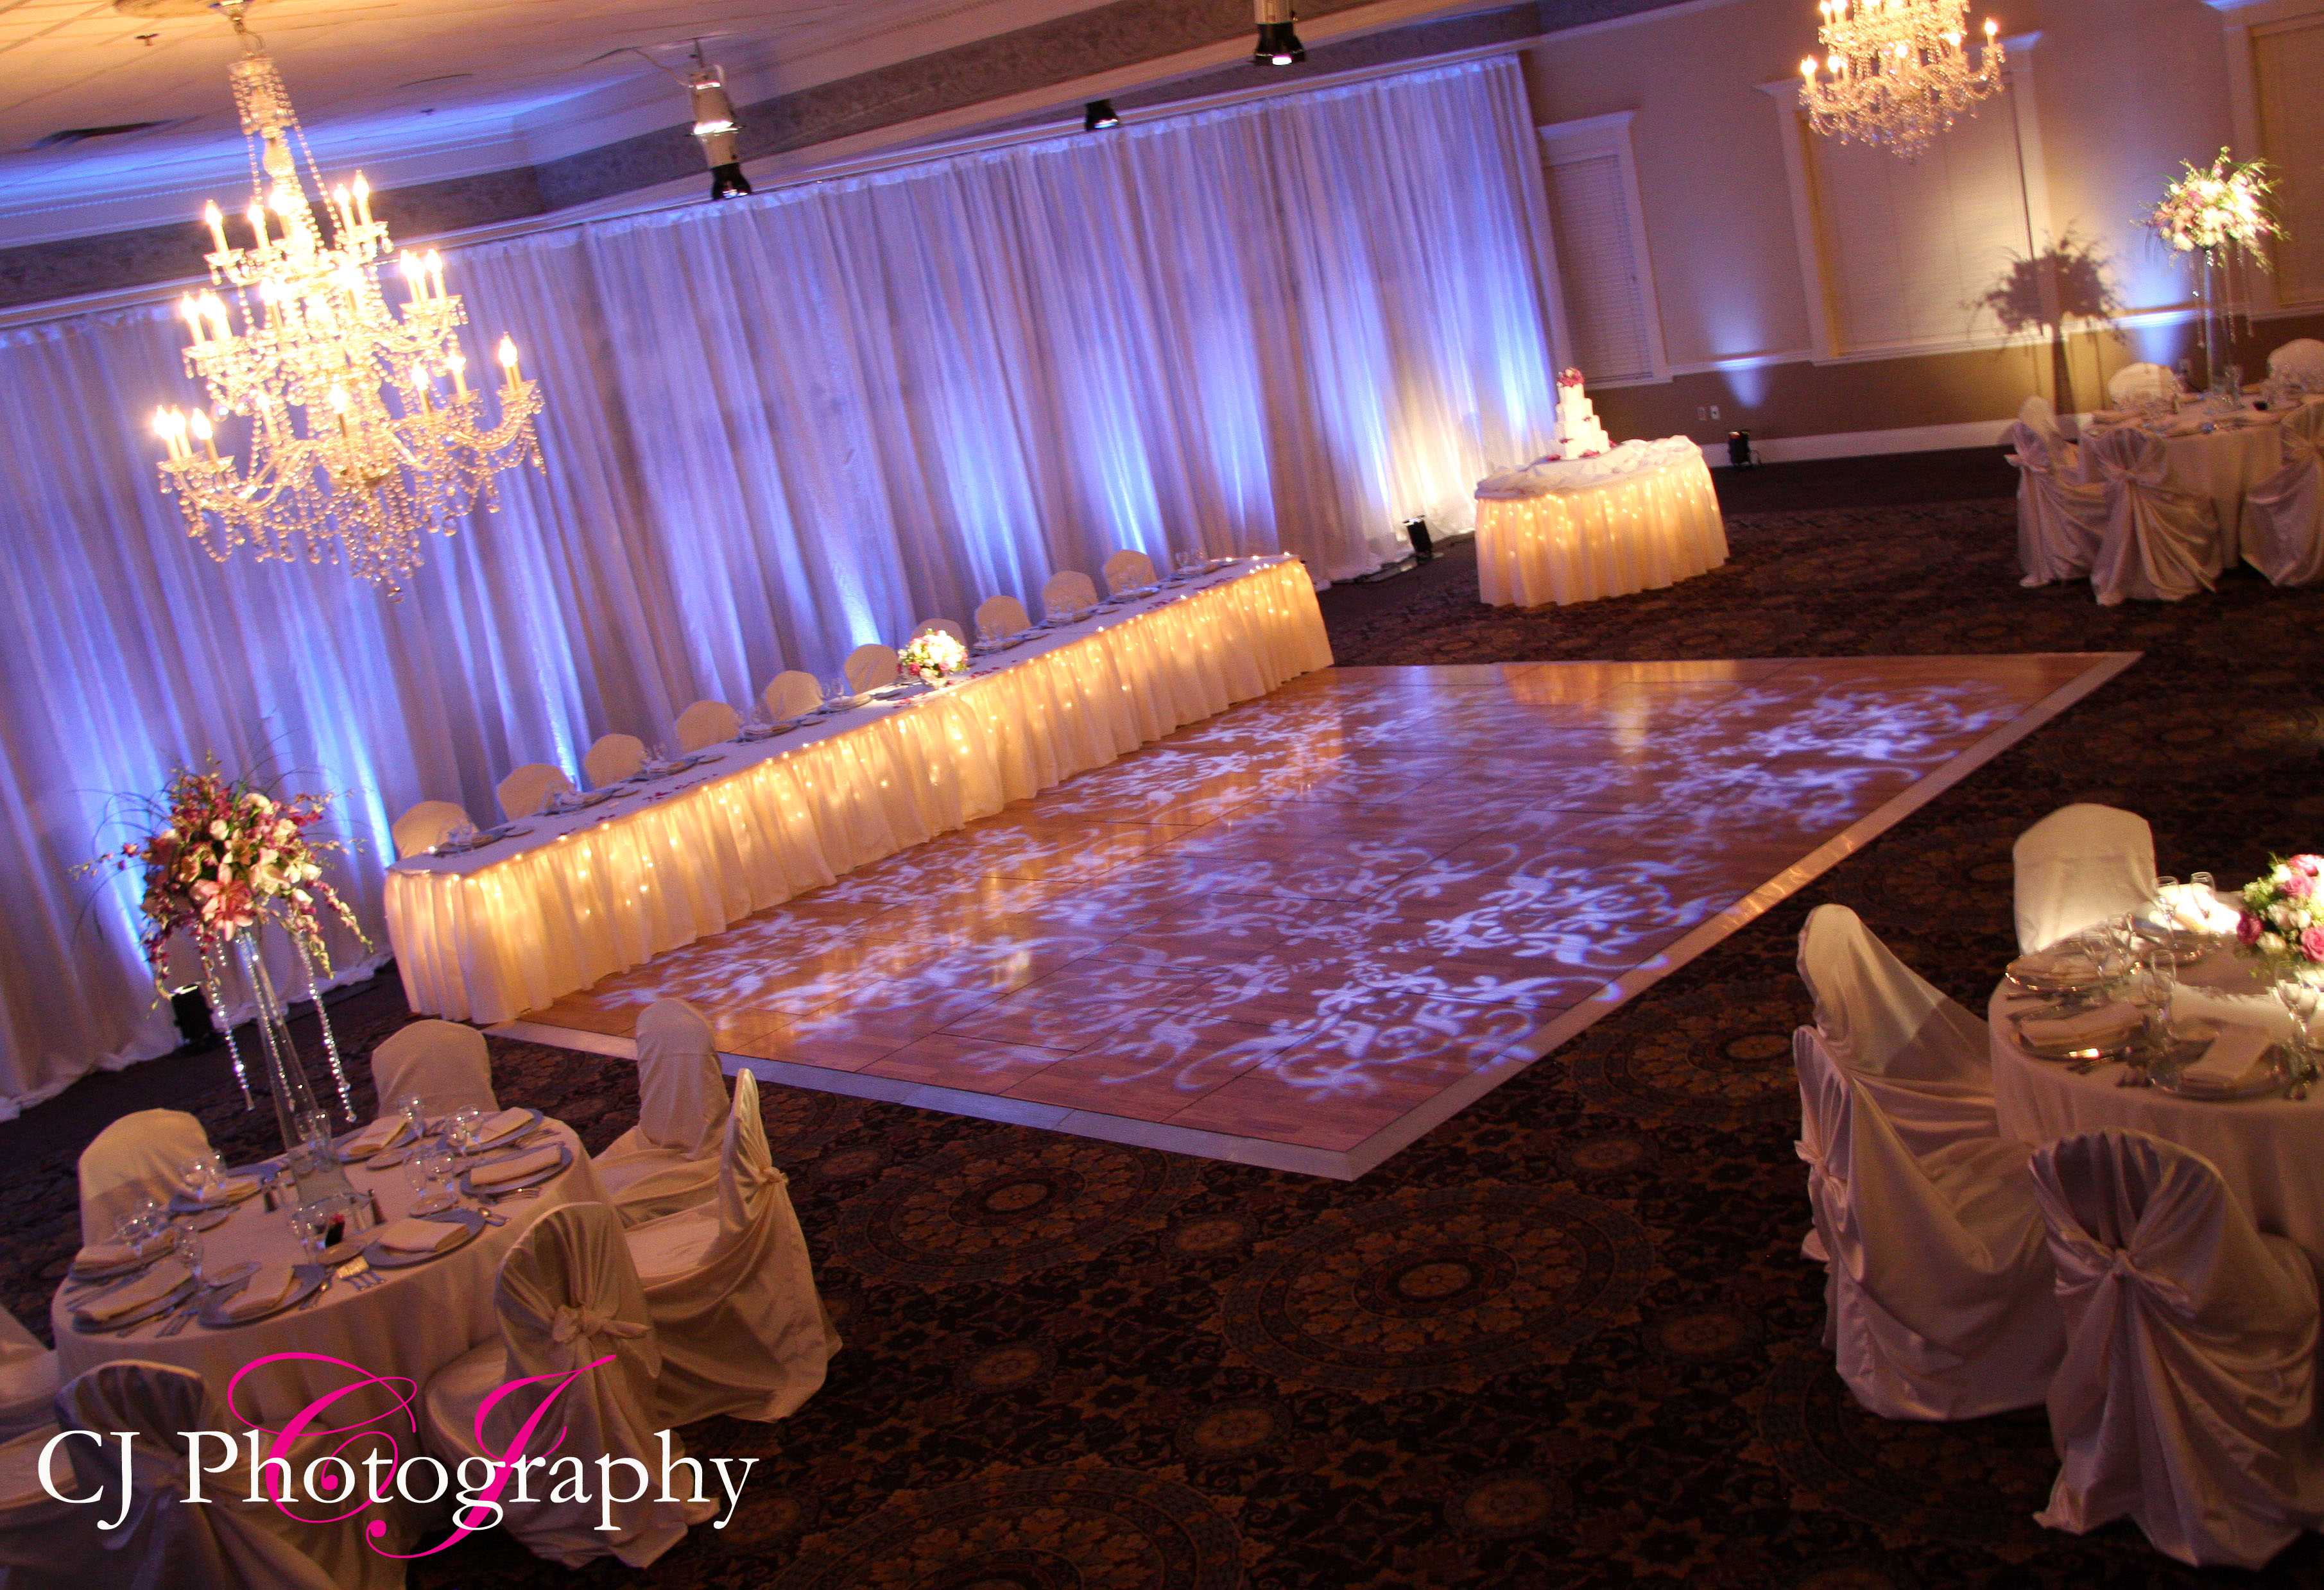 Platinum Weddings The Life Of Cj Photography